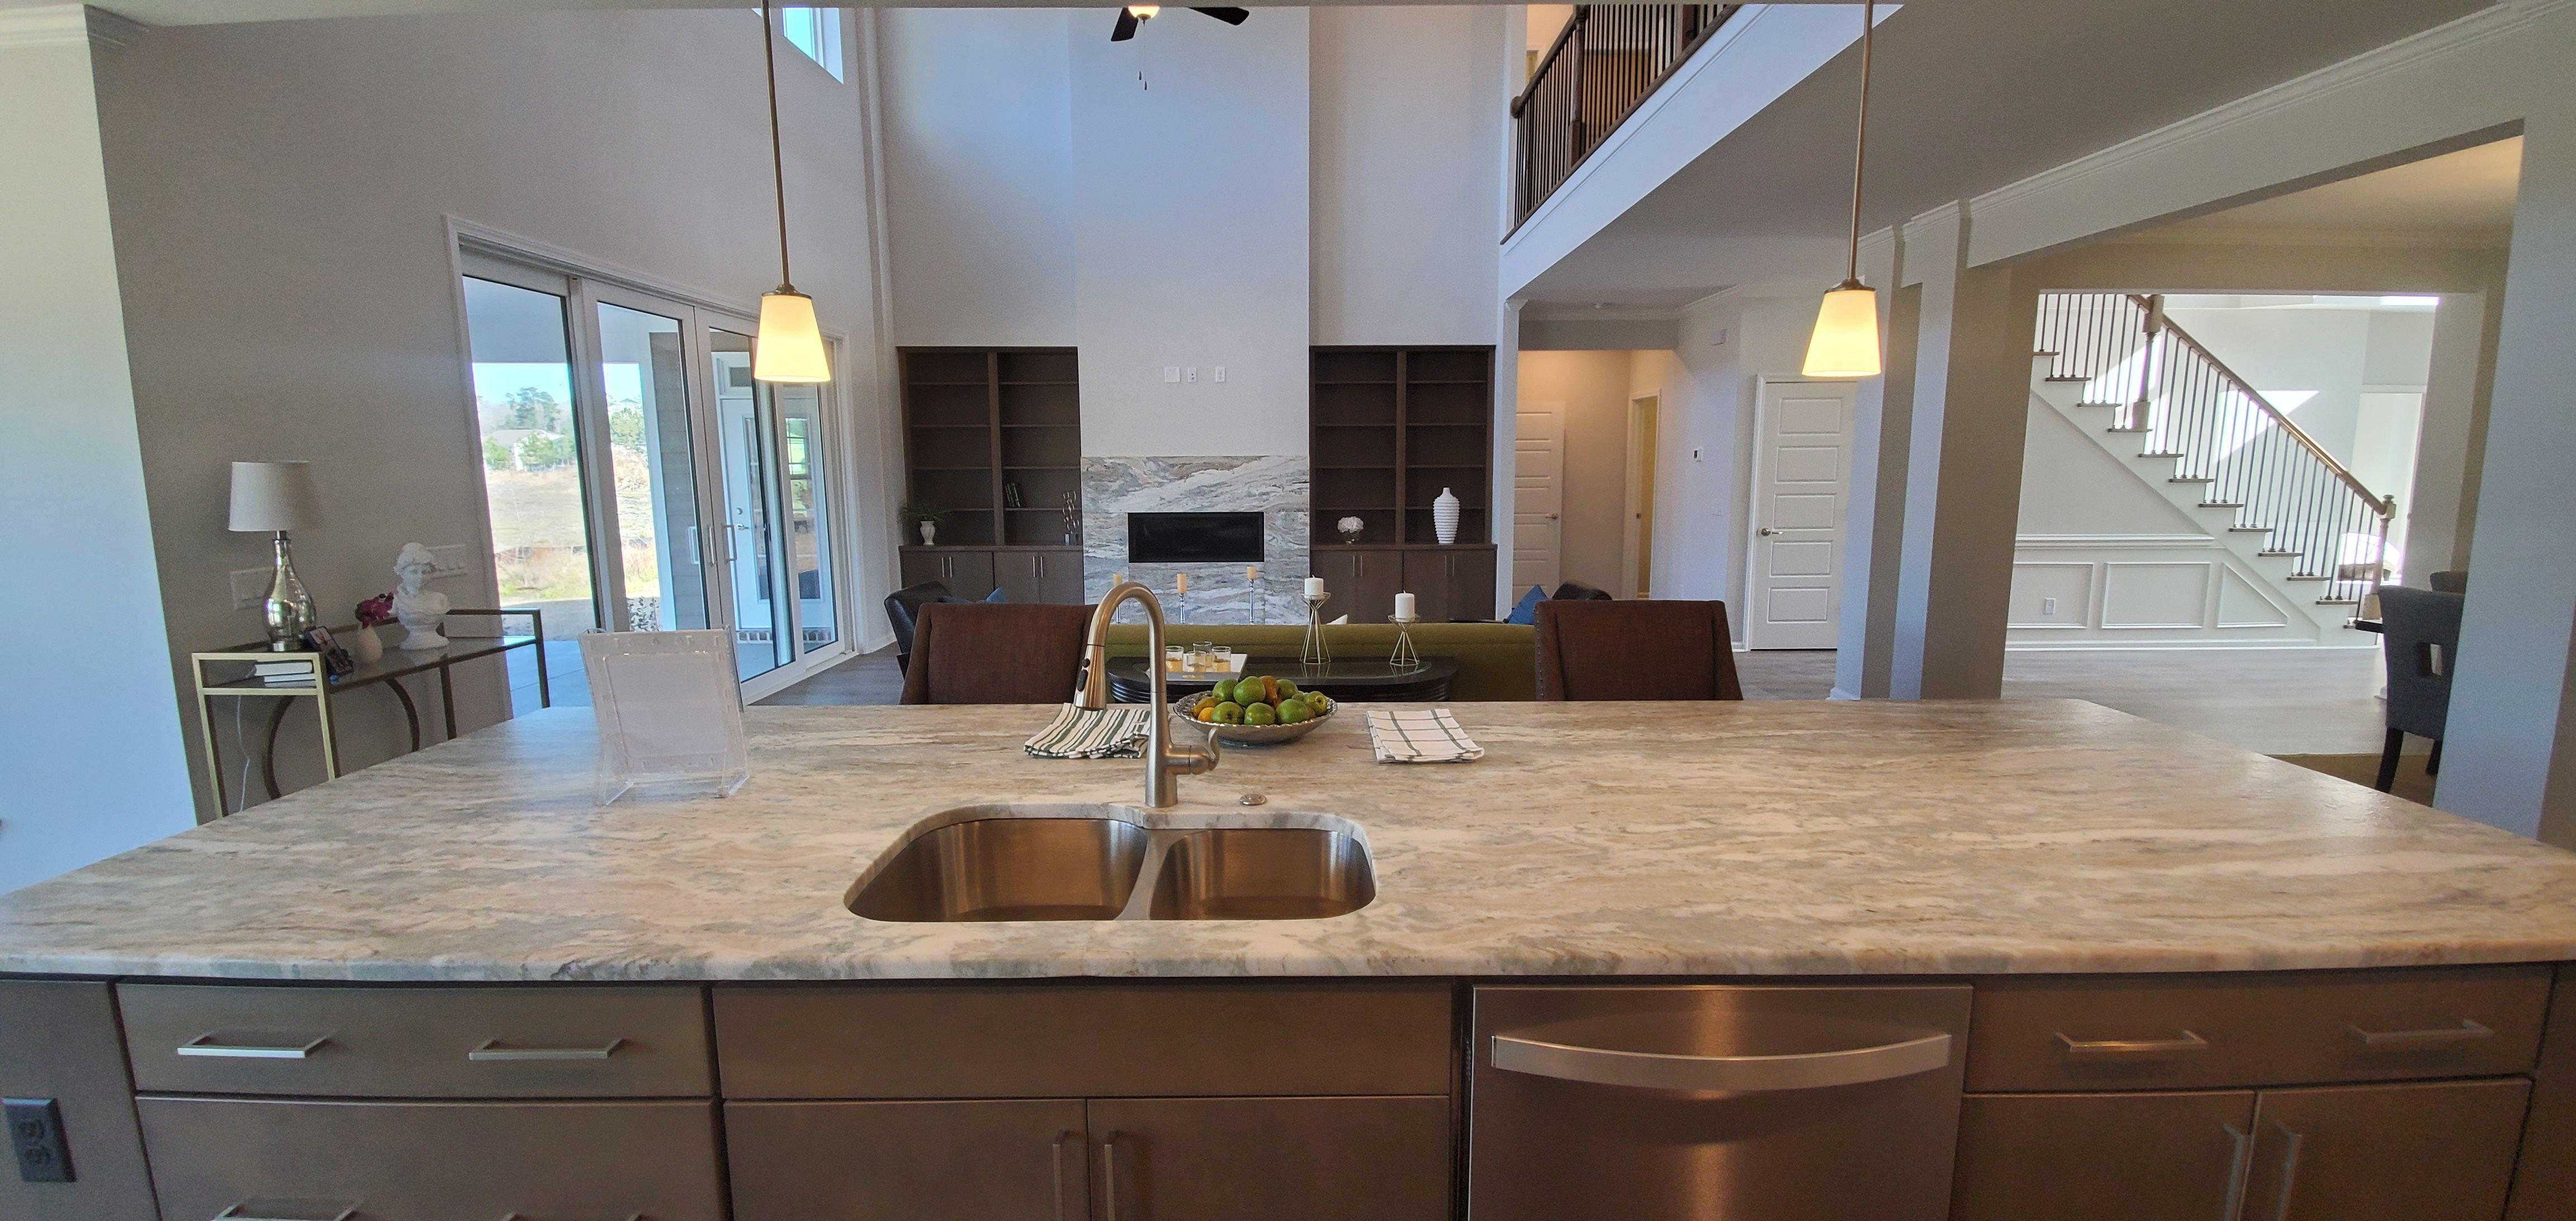 Kitchen featured in the Colleton II By Landmark 24 Homes  in Savannah, GA